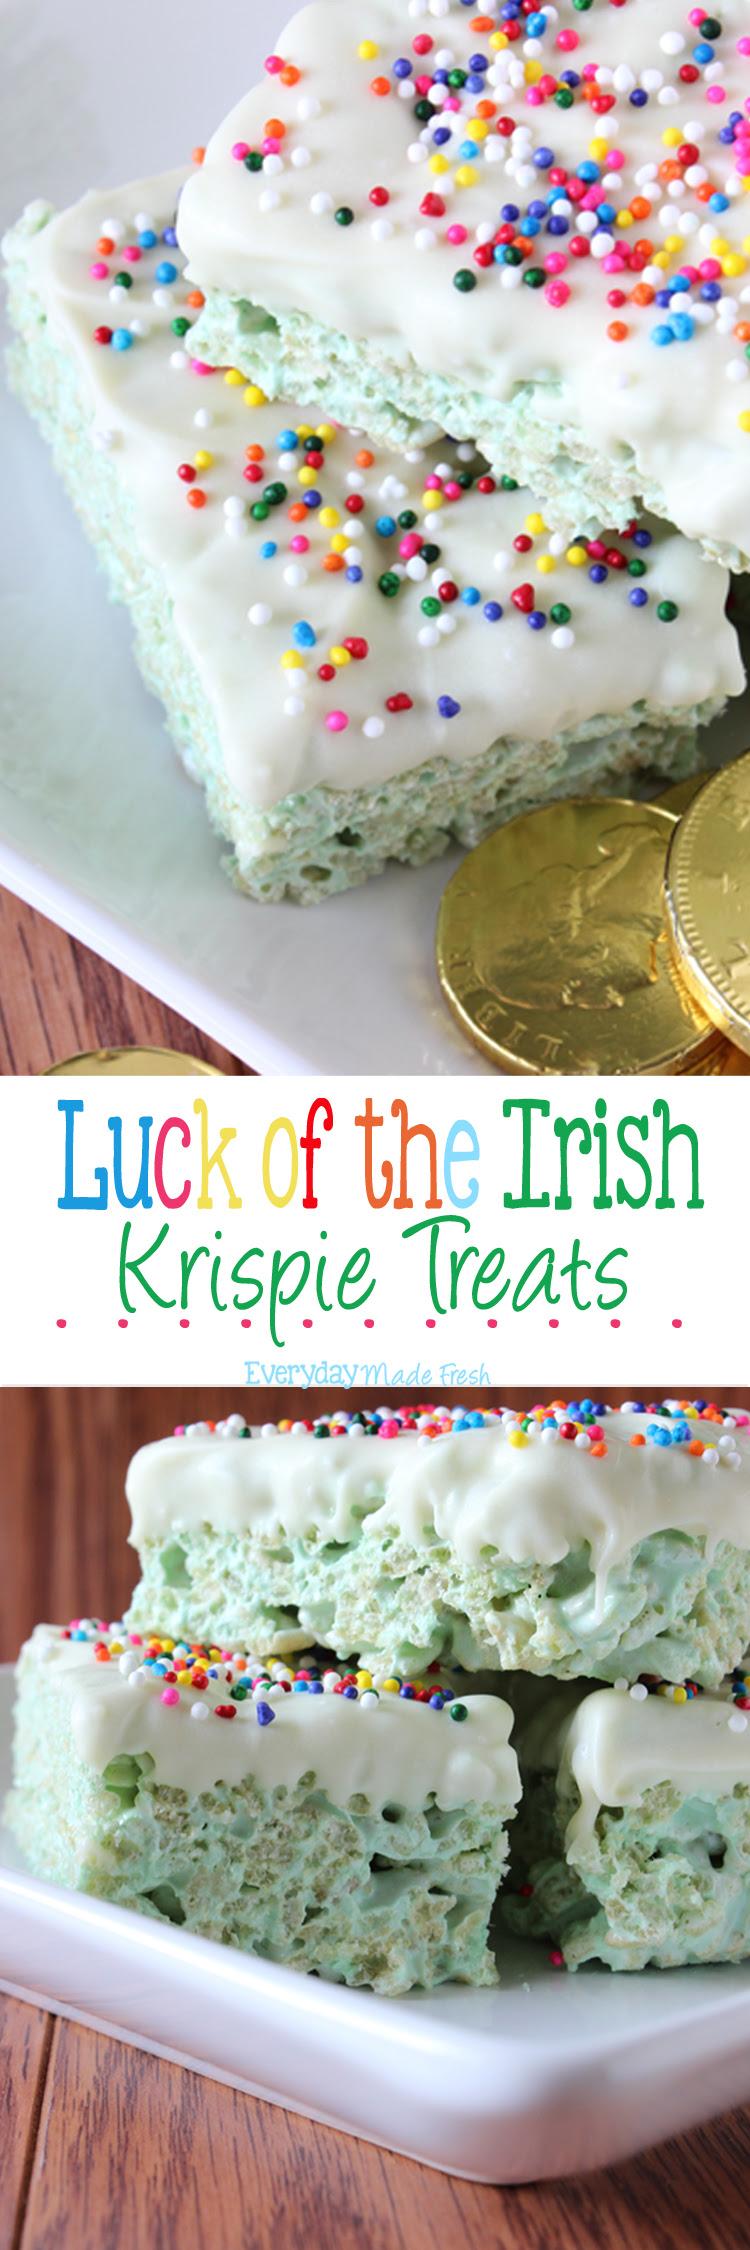 Luck of the Irish Rice Krispie Treats - Oh My Creative